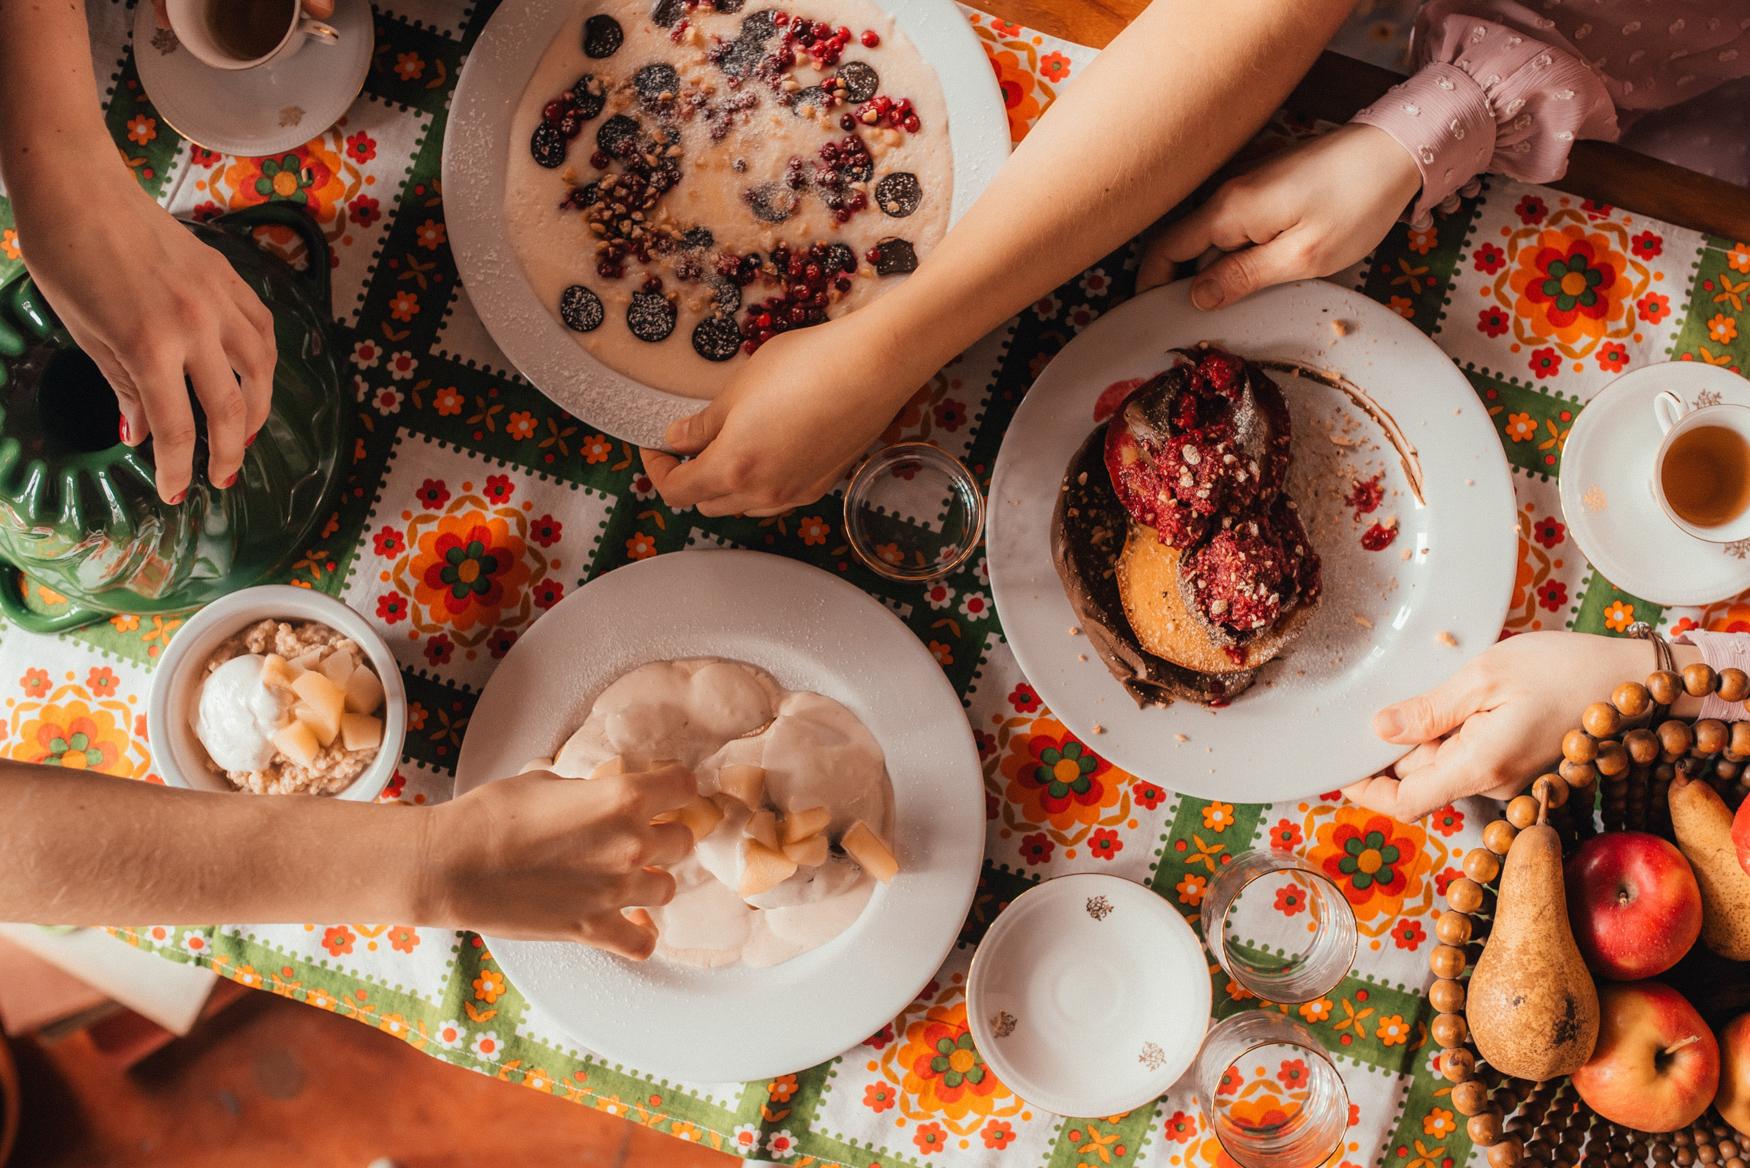 zufana feb2018 editorial food photography 020.jpg